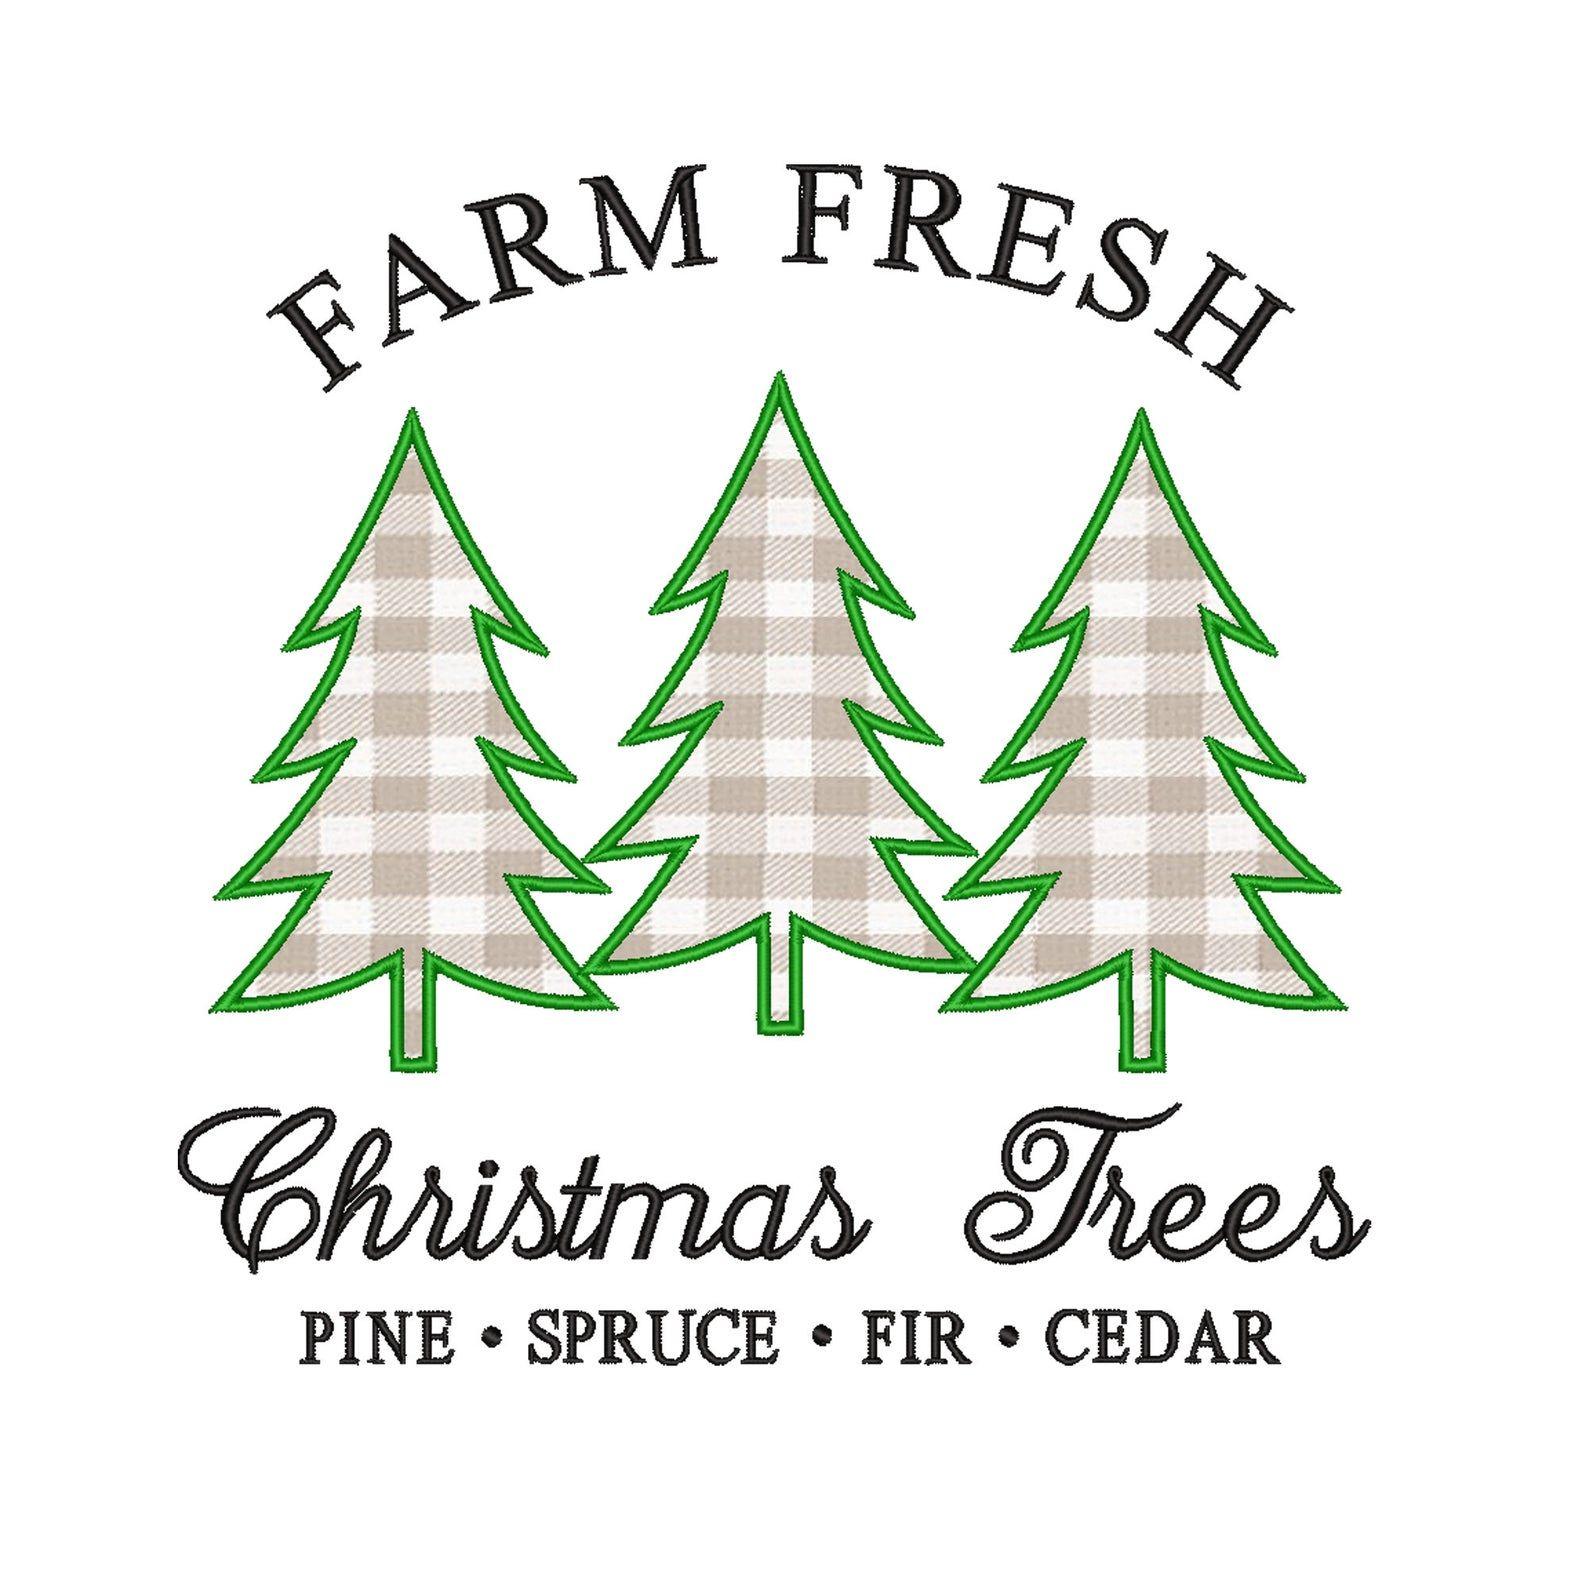 Farm Fresh Christmas Trees Applique Designs Machine Embroidery Instant Digital Download Christmas Tree Embroidery Design Machine Embroidery Designs Christmas Fresh Christmas Trees